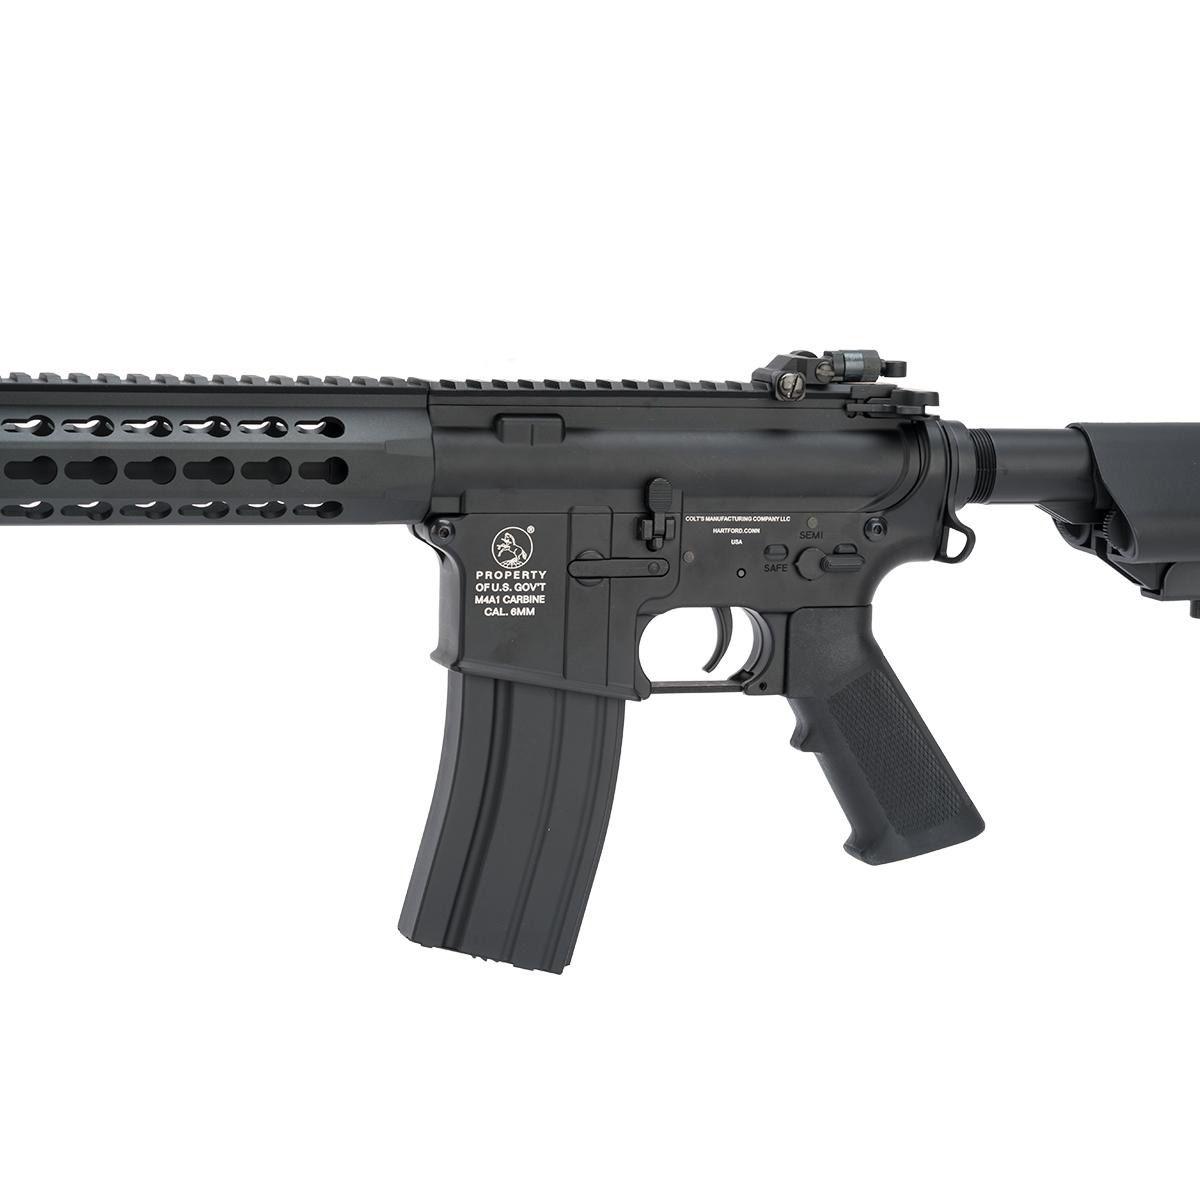 Rifle Airsoft M4A1 Keymod long - Full metal Cybergun